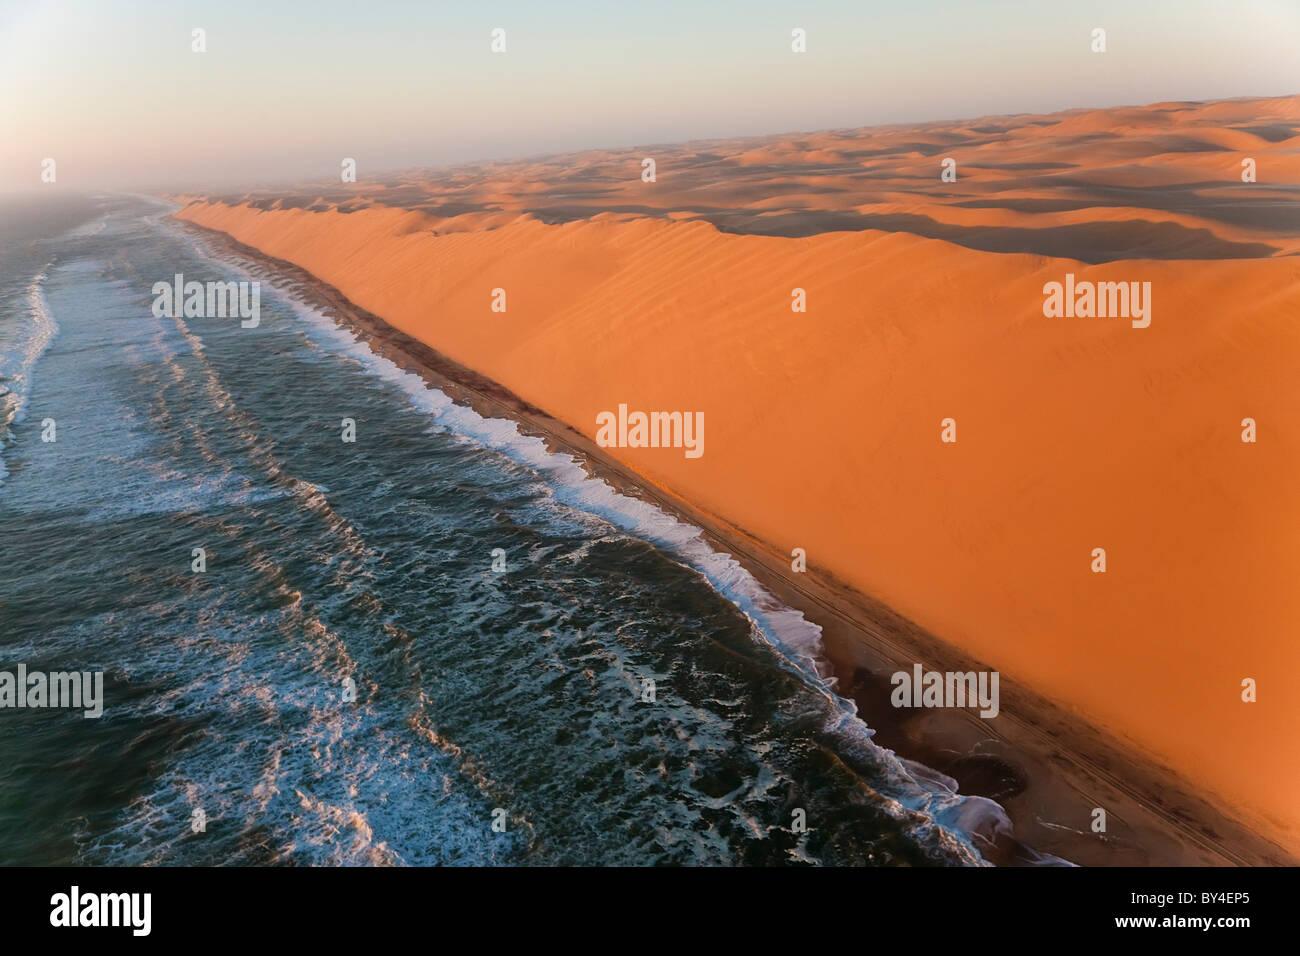 Aerial view over sand dunes & sea, Namib Desert, Namibia - Stock Image